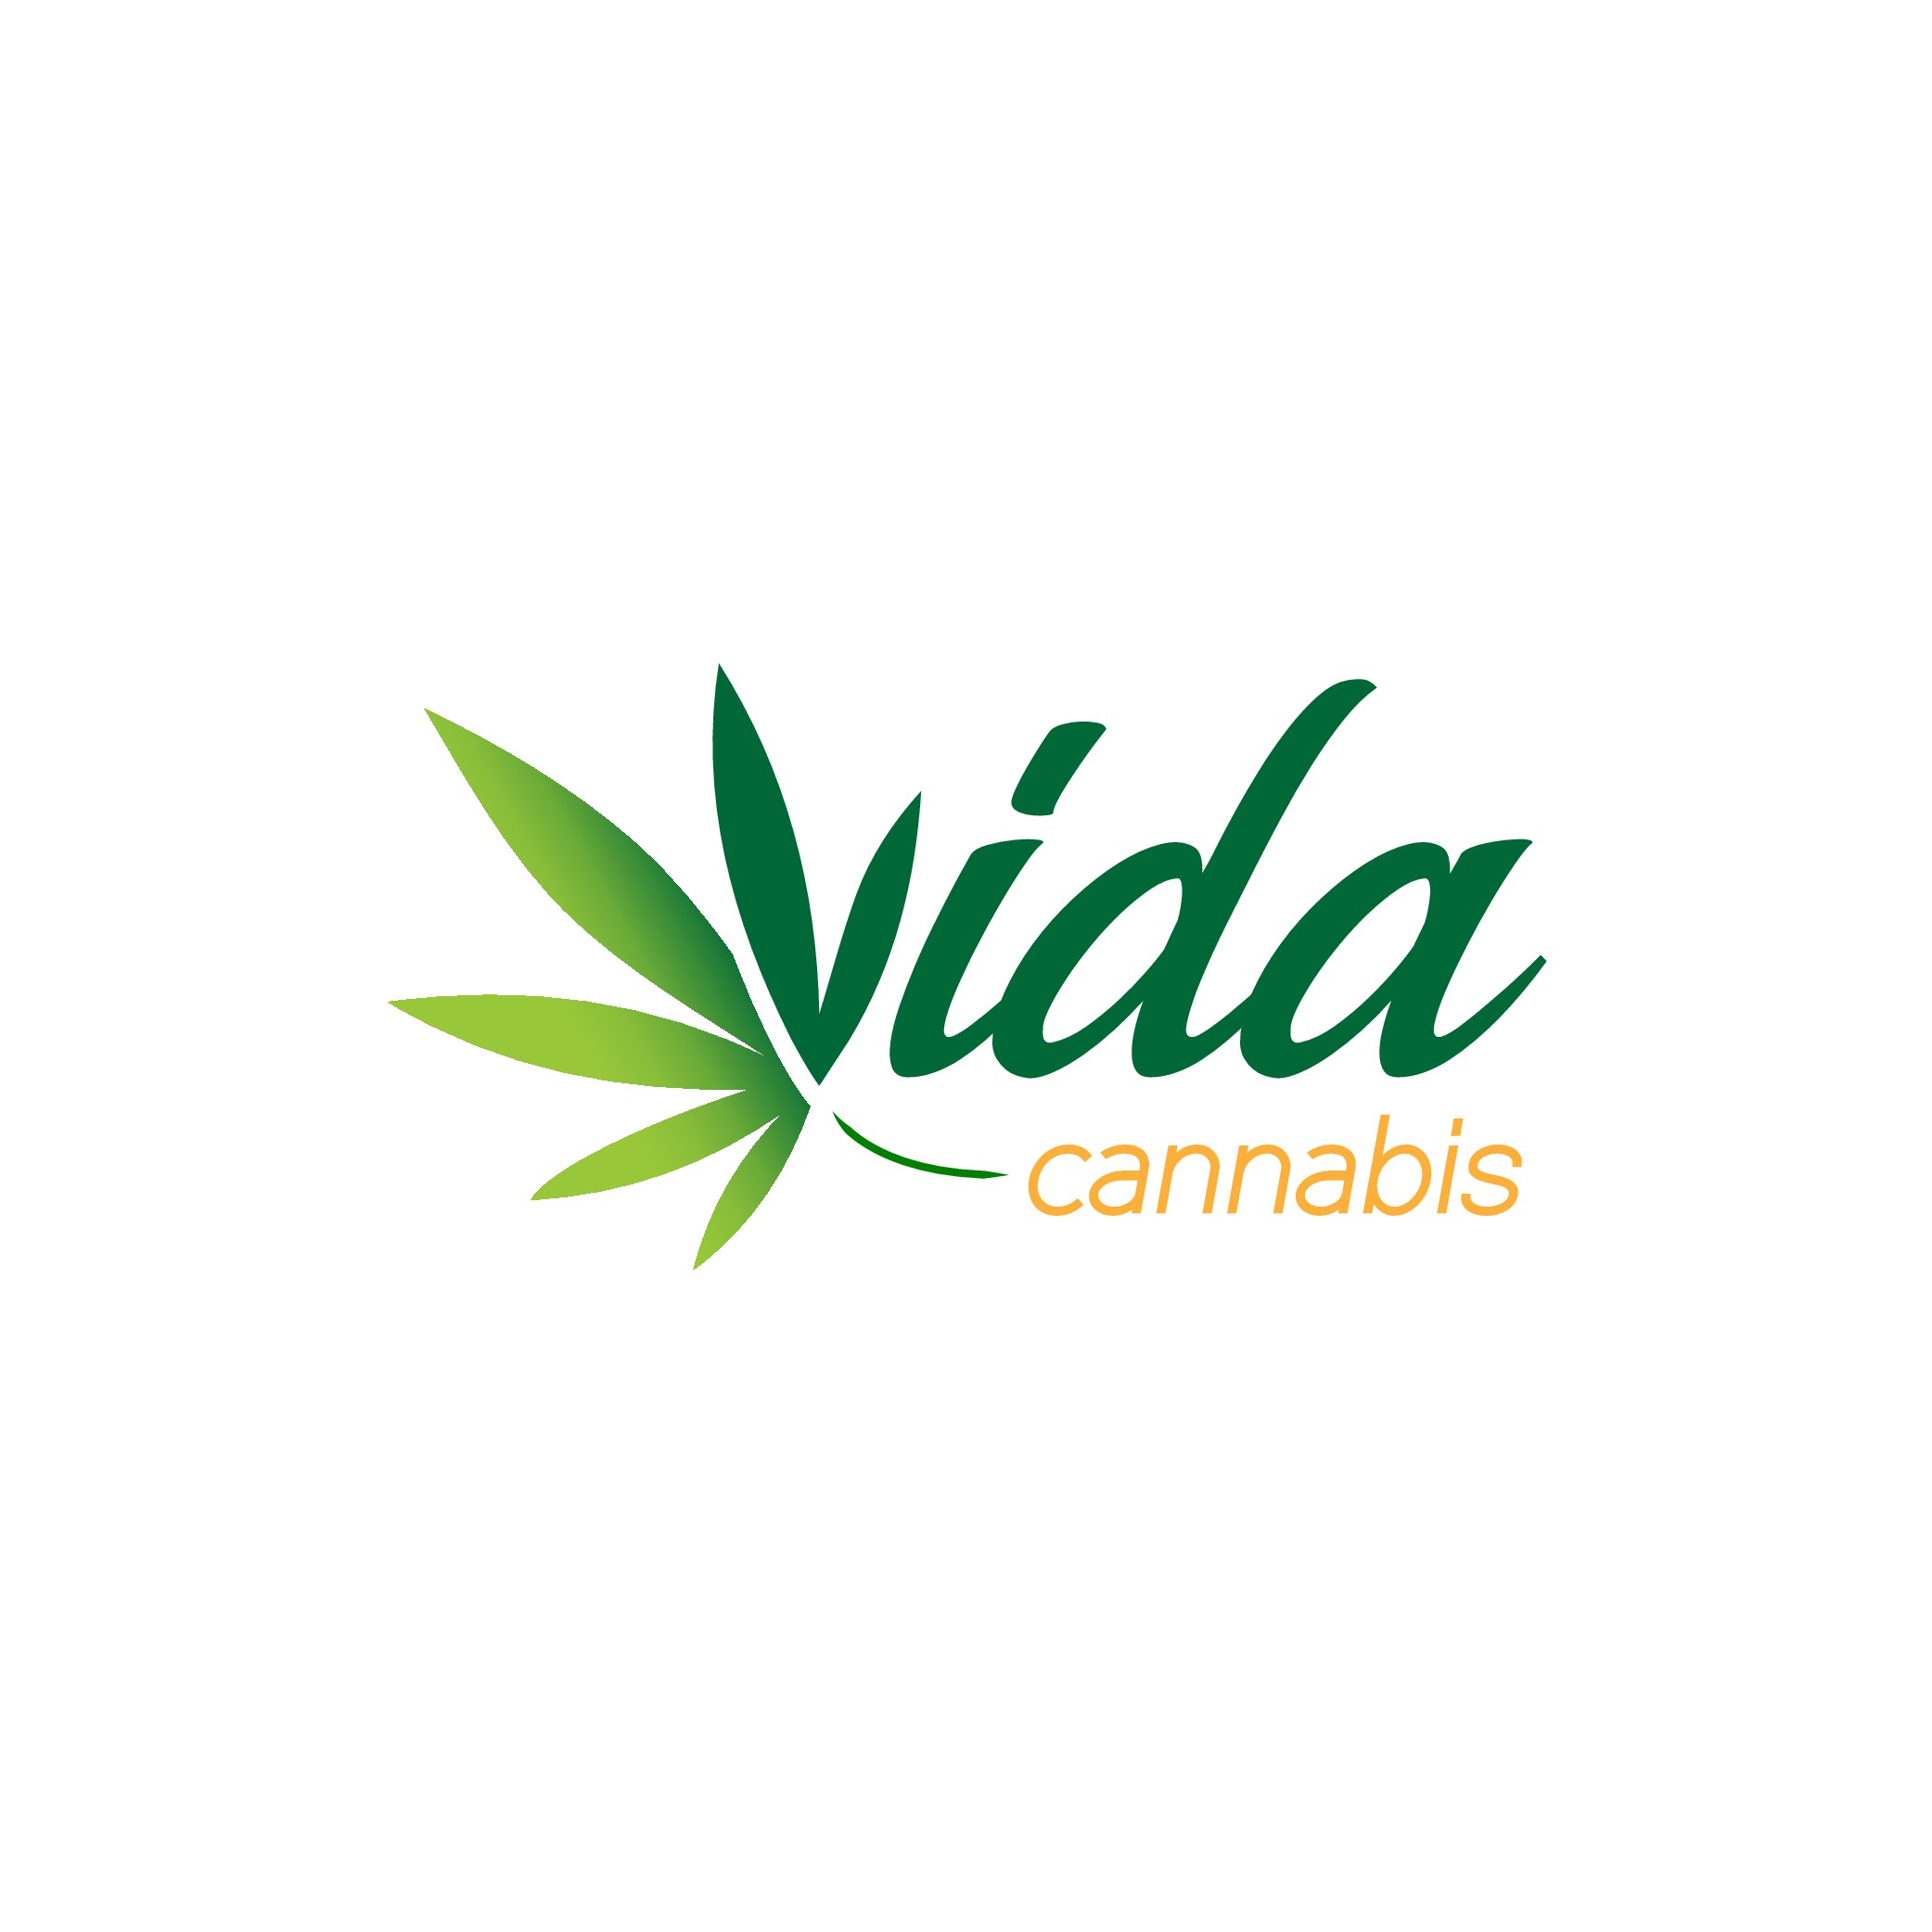 Memorable and modern logo for Vida Cannabis